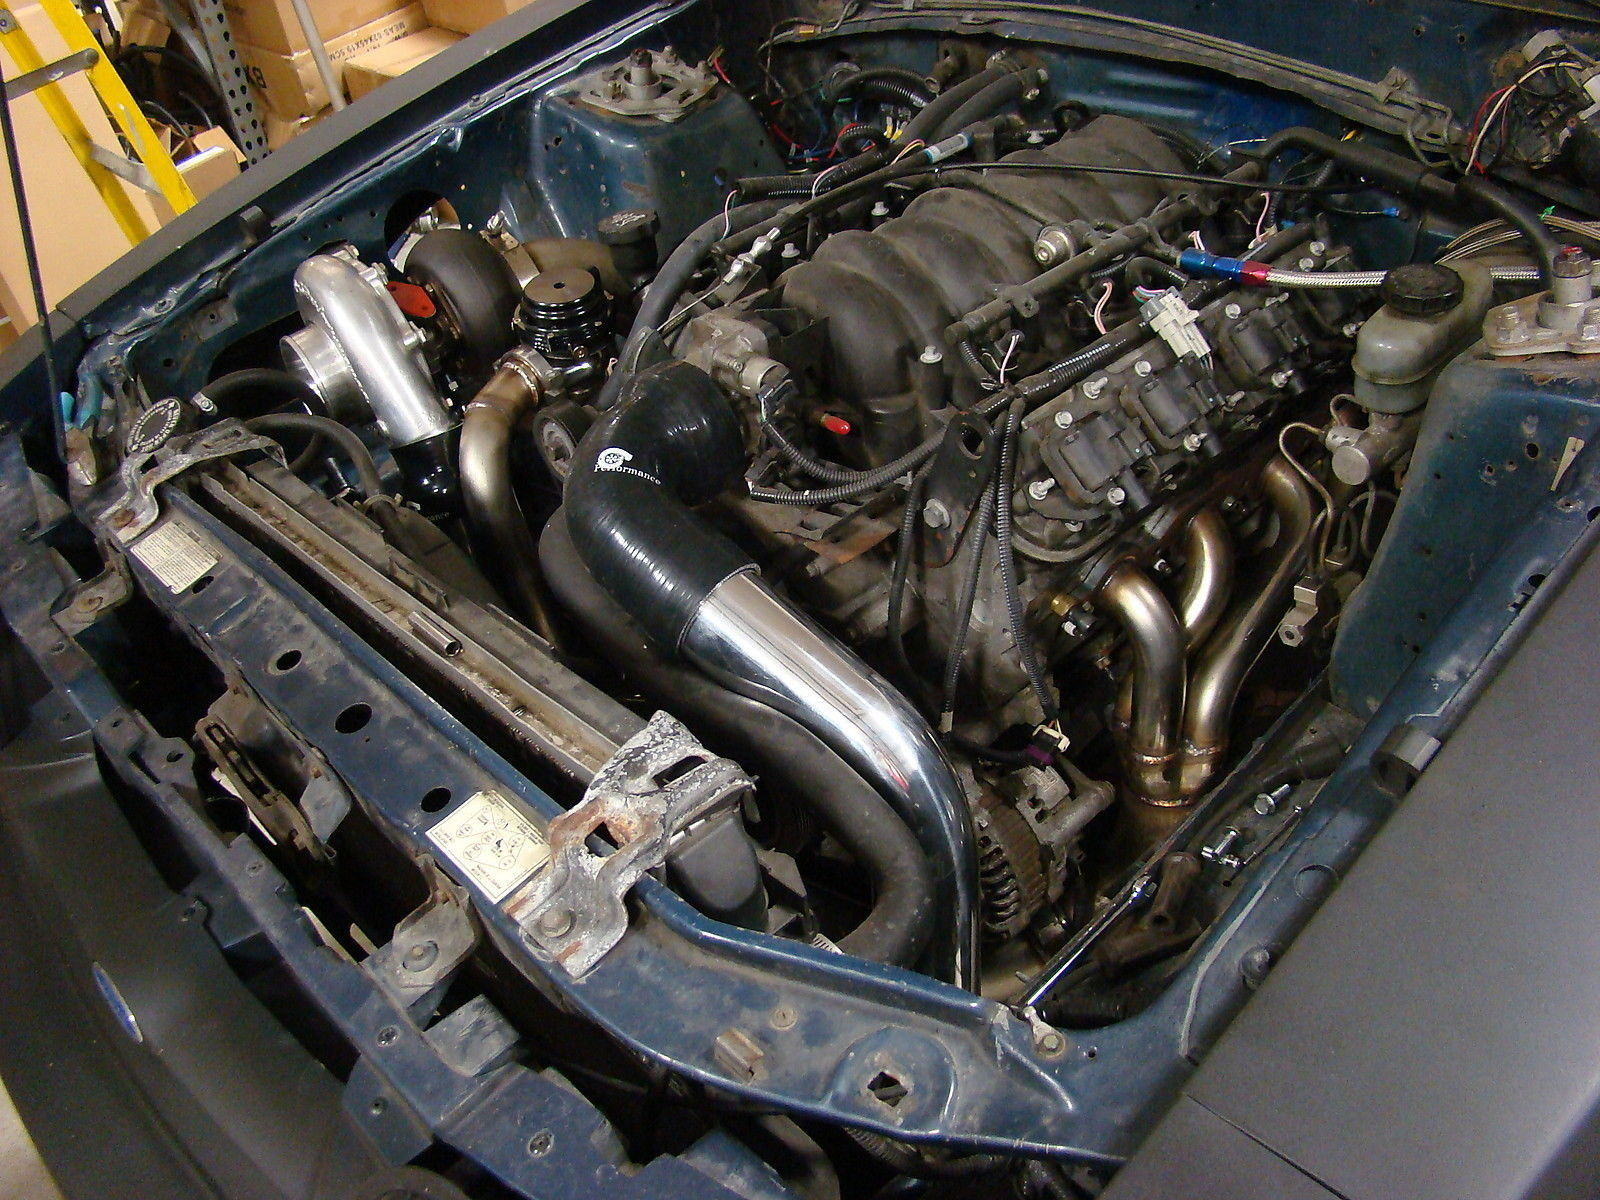 1979 Chevy Alternator Wiring Diagram 1987 1993 Mustang Lsx Swapped Foxbody Single Turbo